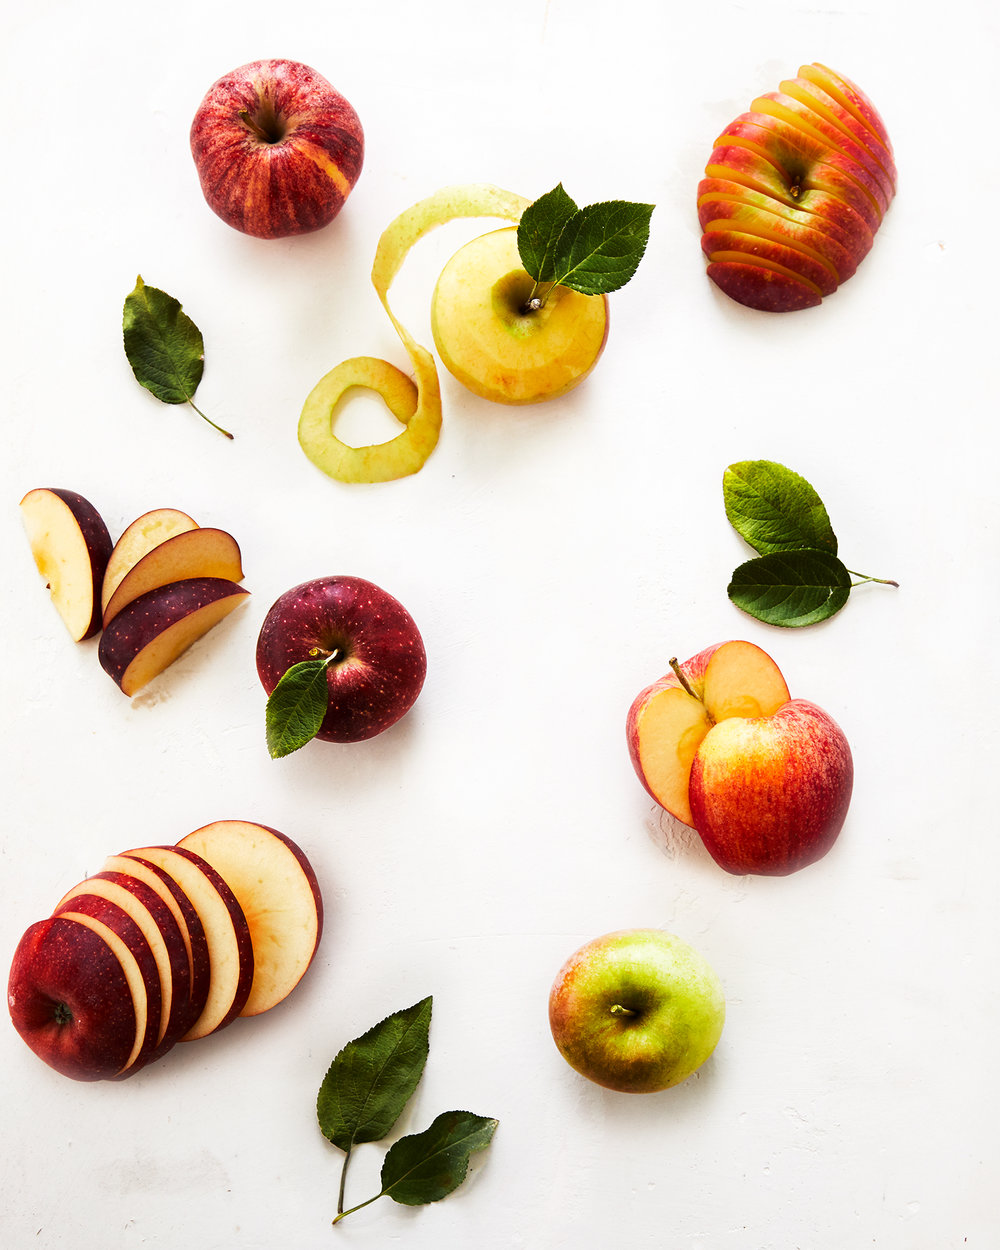 Apples1831.jpg